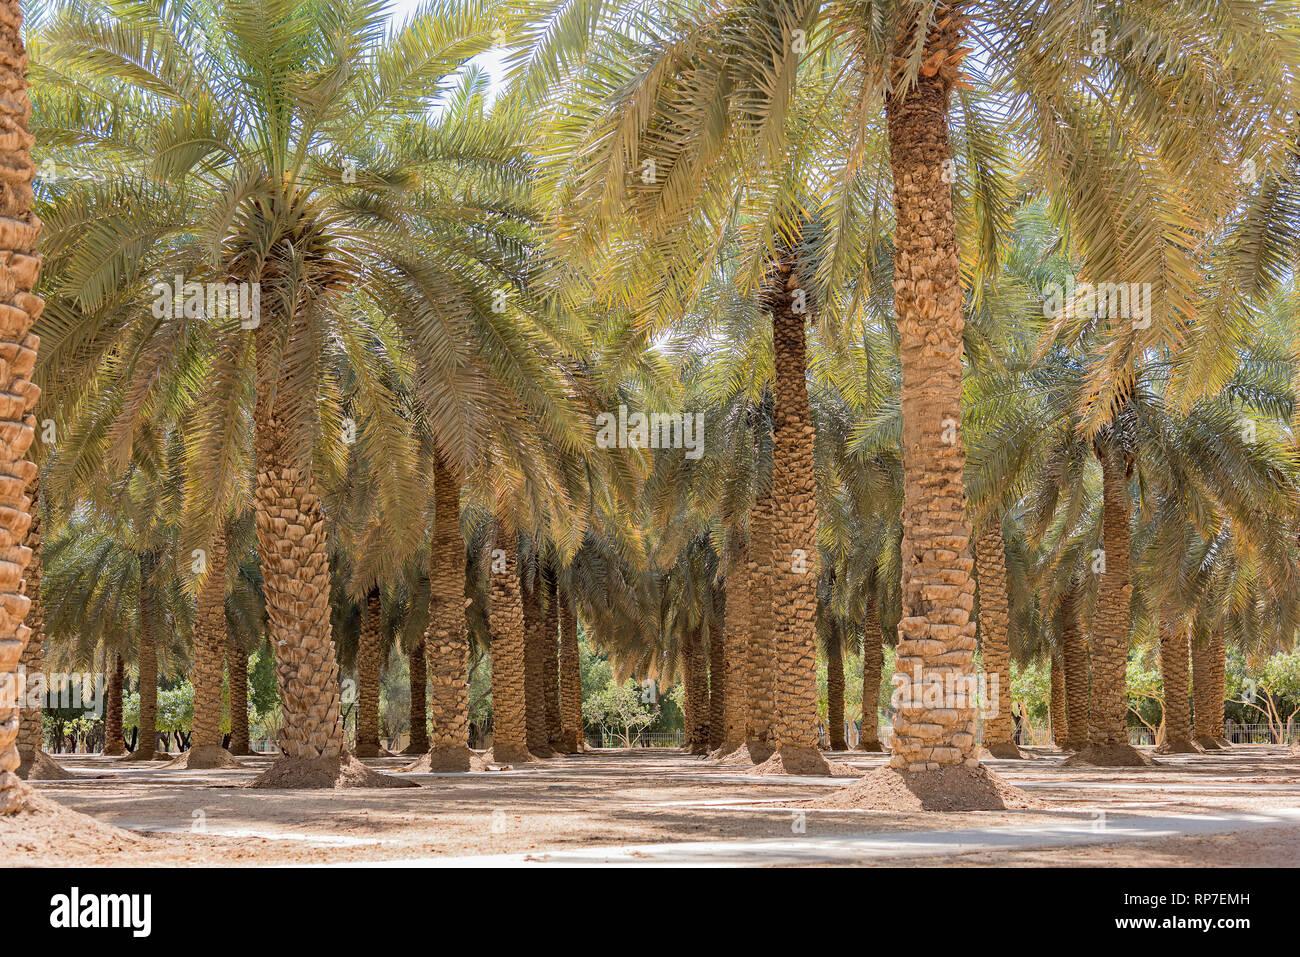 Palm Tree Park en Riyadh, Arabia Saudita Imagen De Stock